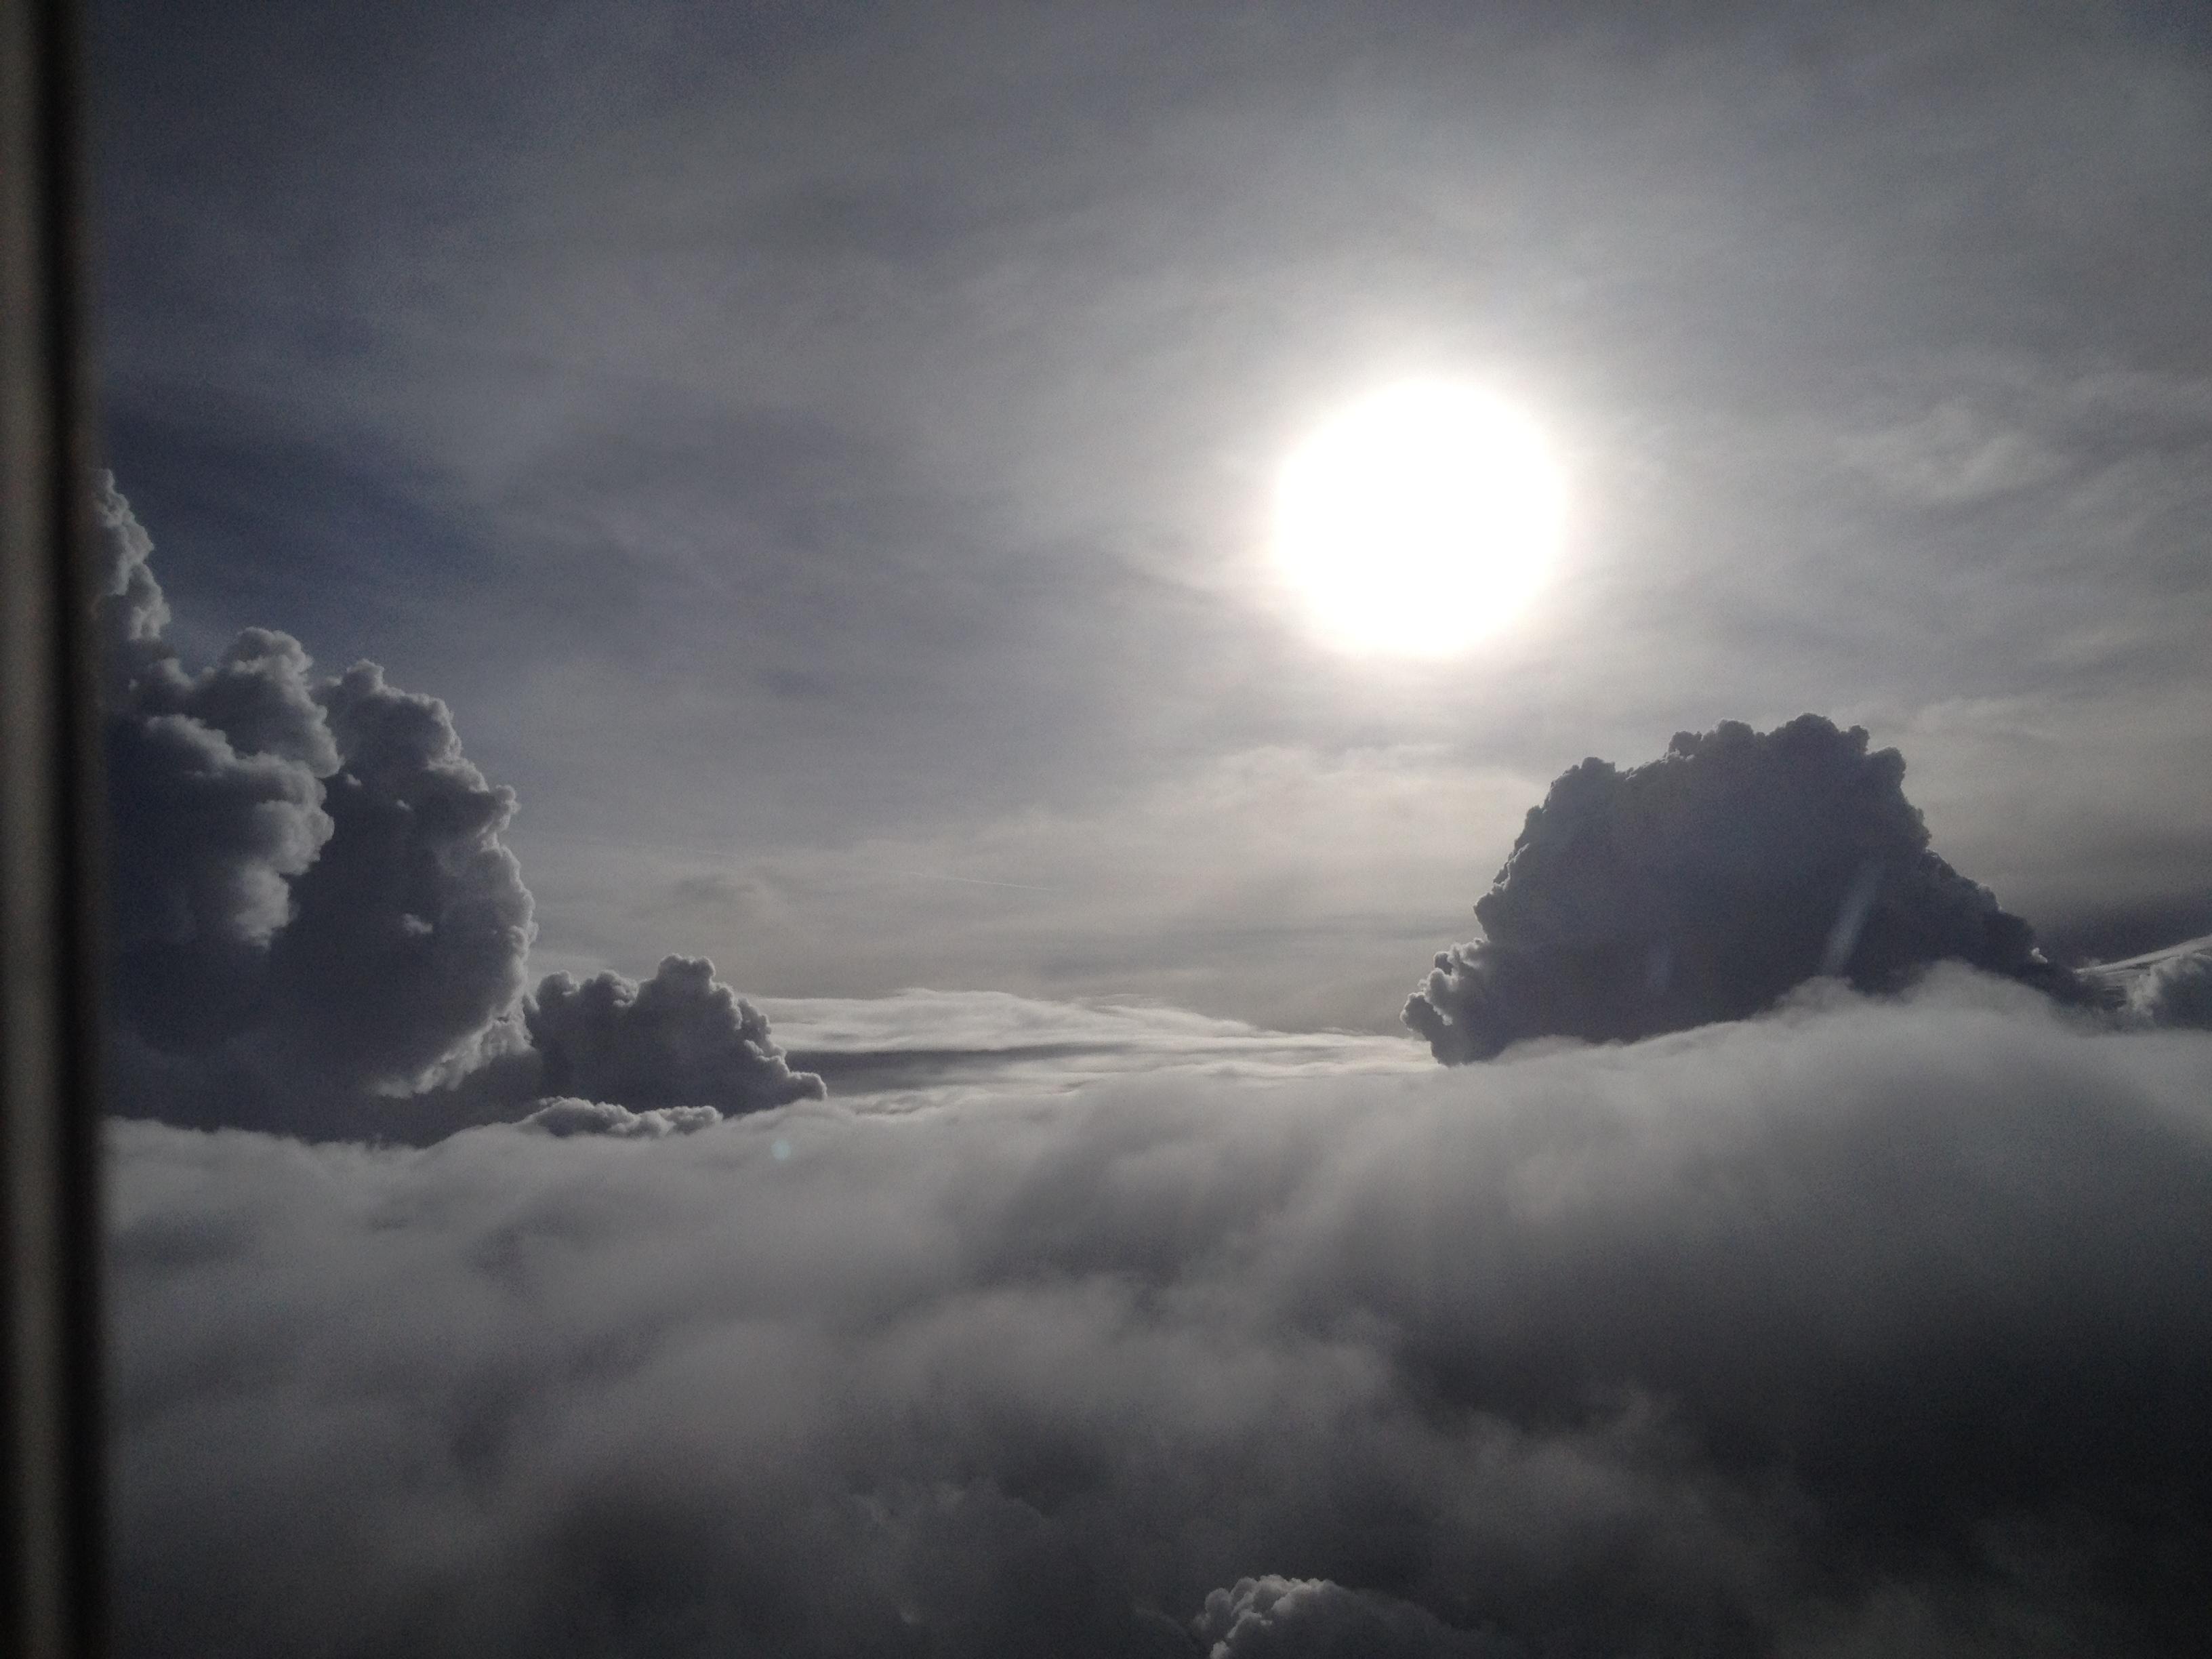 Fantasy Sun & Cloud (photographed by sunisthefuture-Susan Sun Nunamaker)